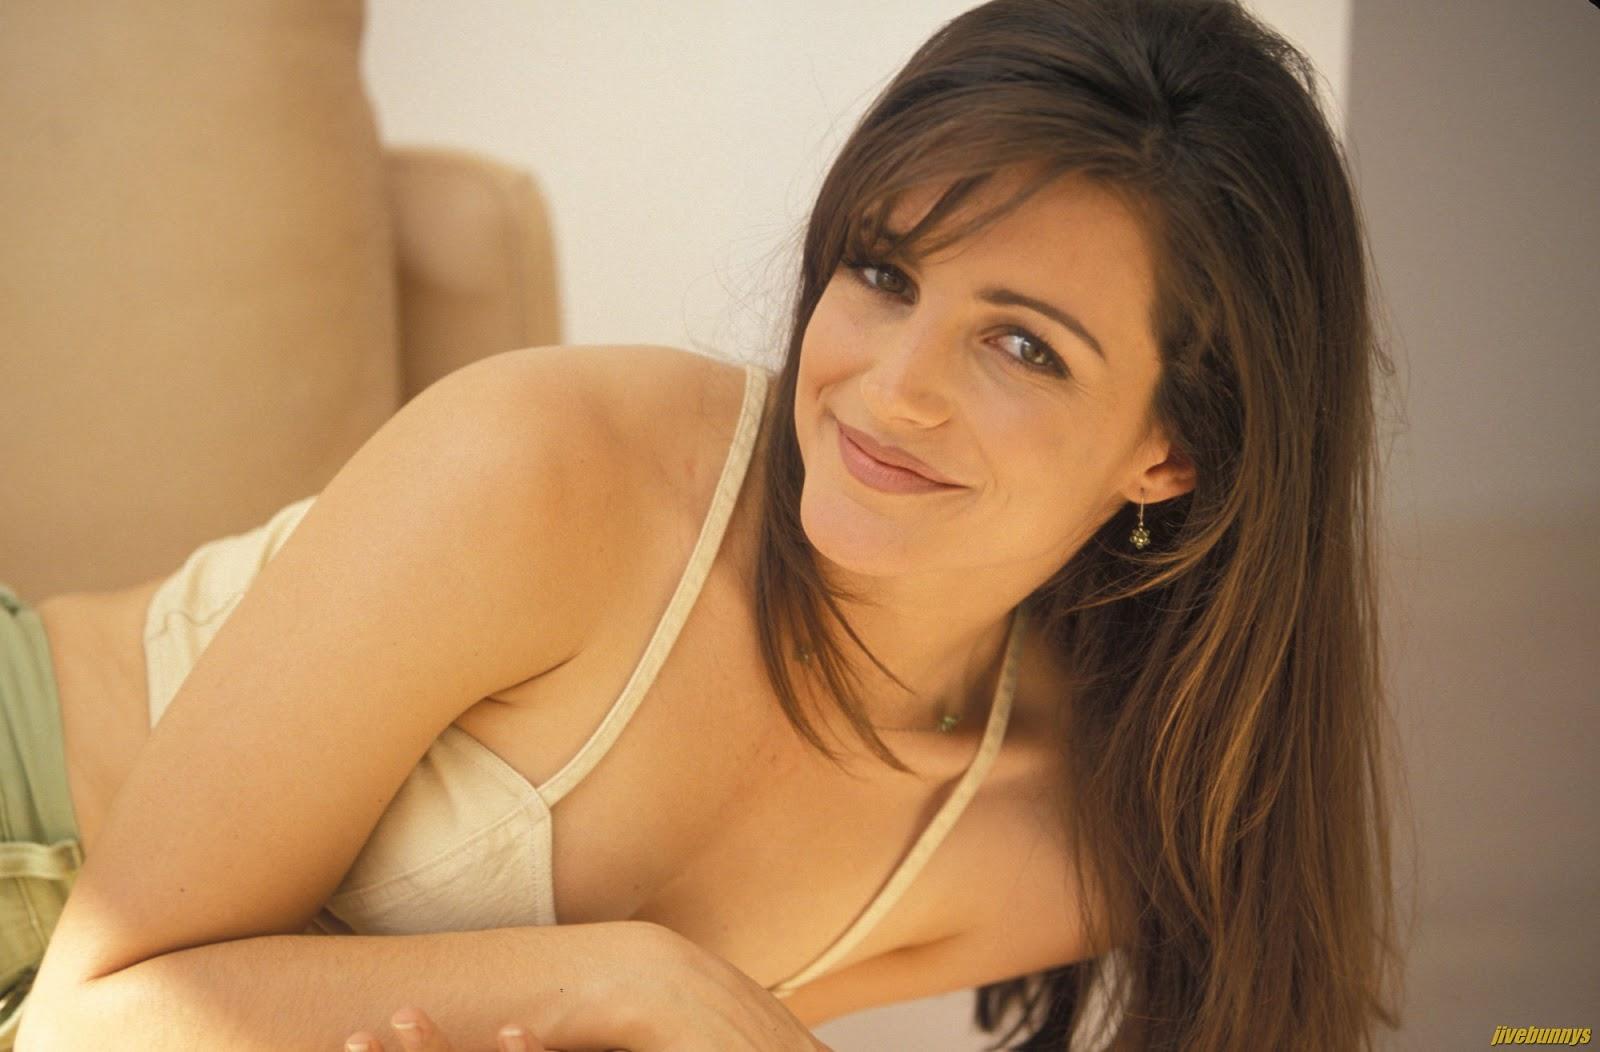 Free porn Kristin Davis galleries Page 1 - ImageFap